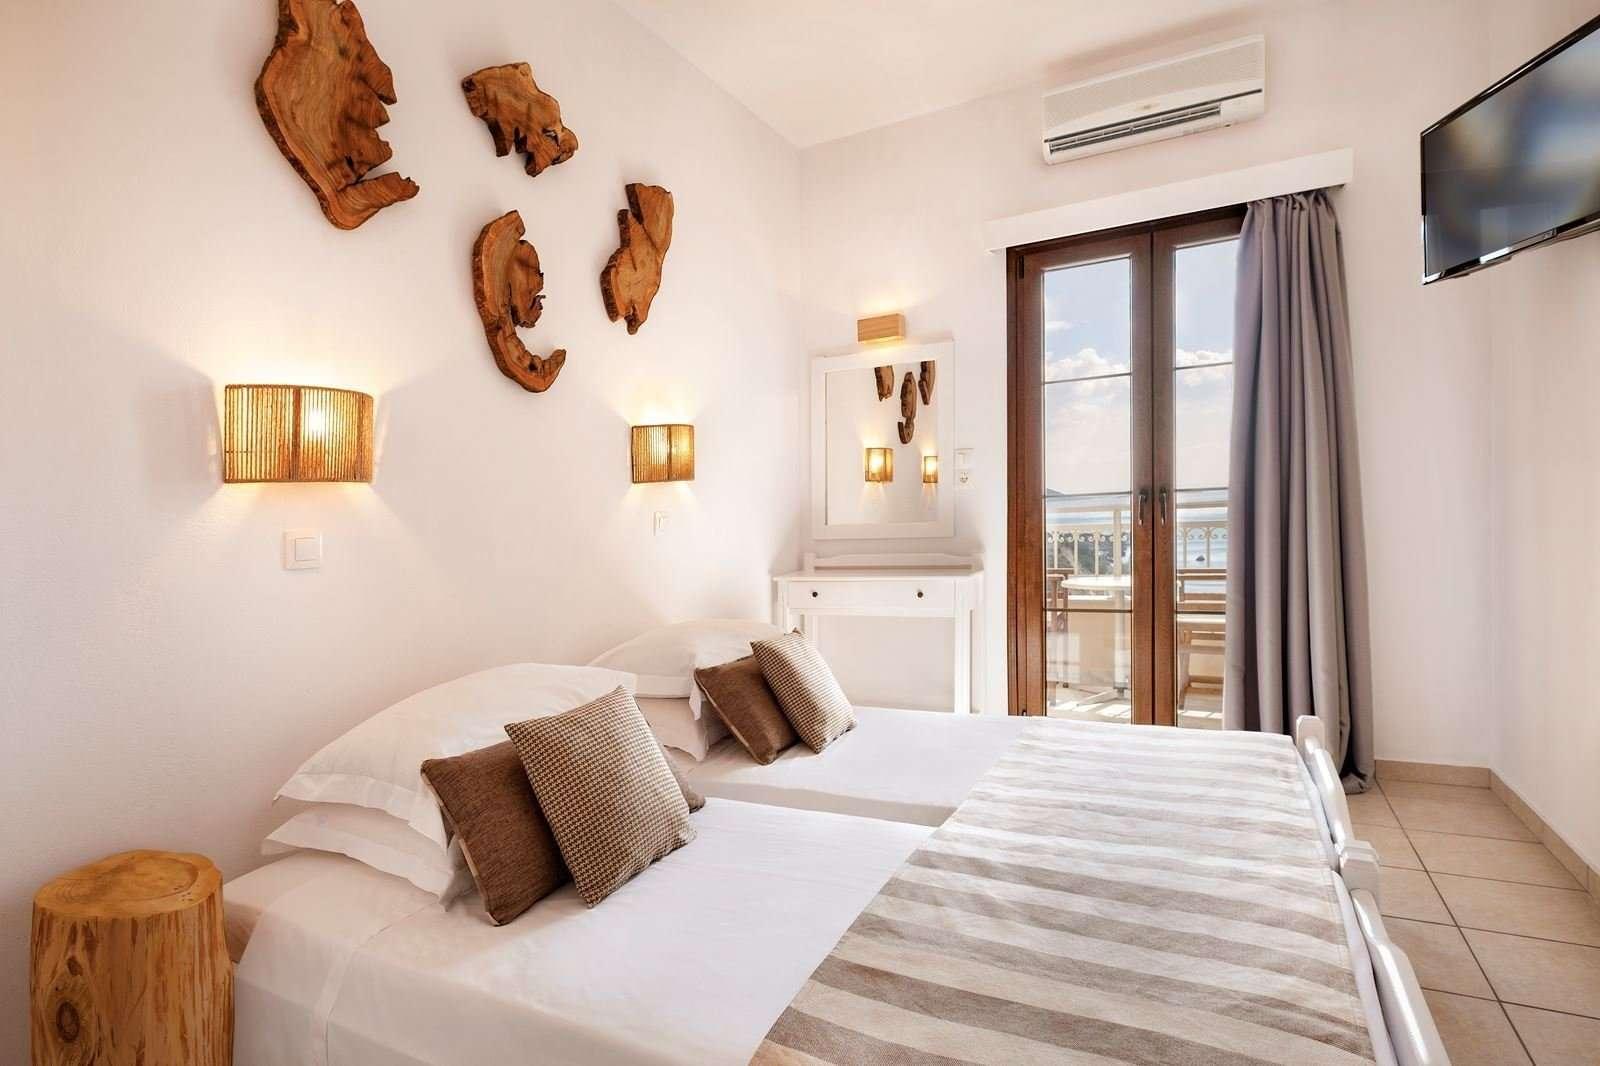 Lithos hotel - kamer zeezicht